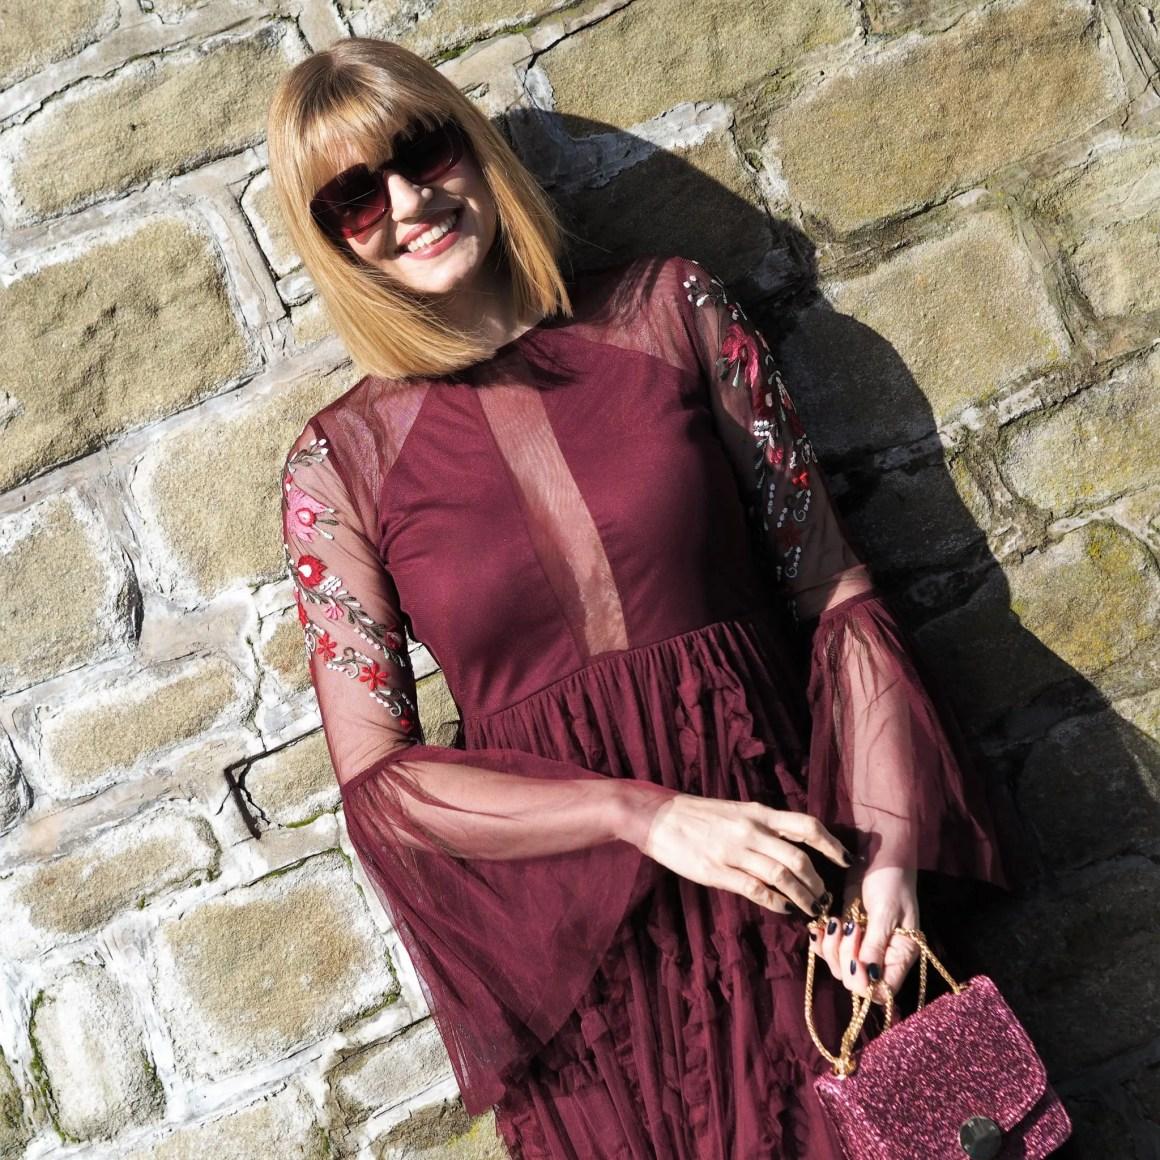 berry ruffled maxi dress and square sunglasses